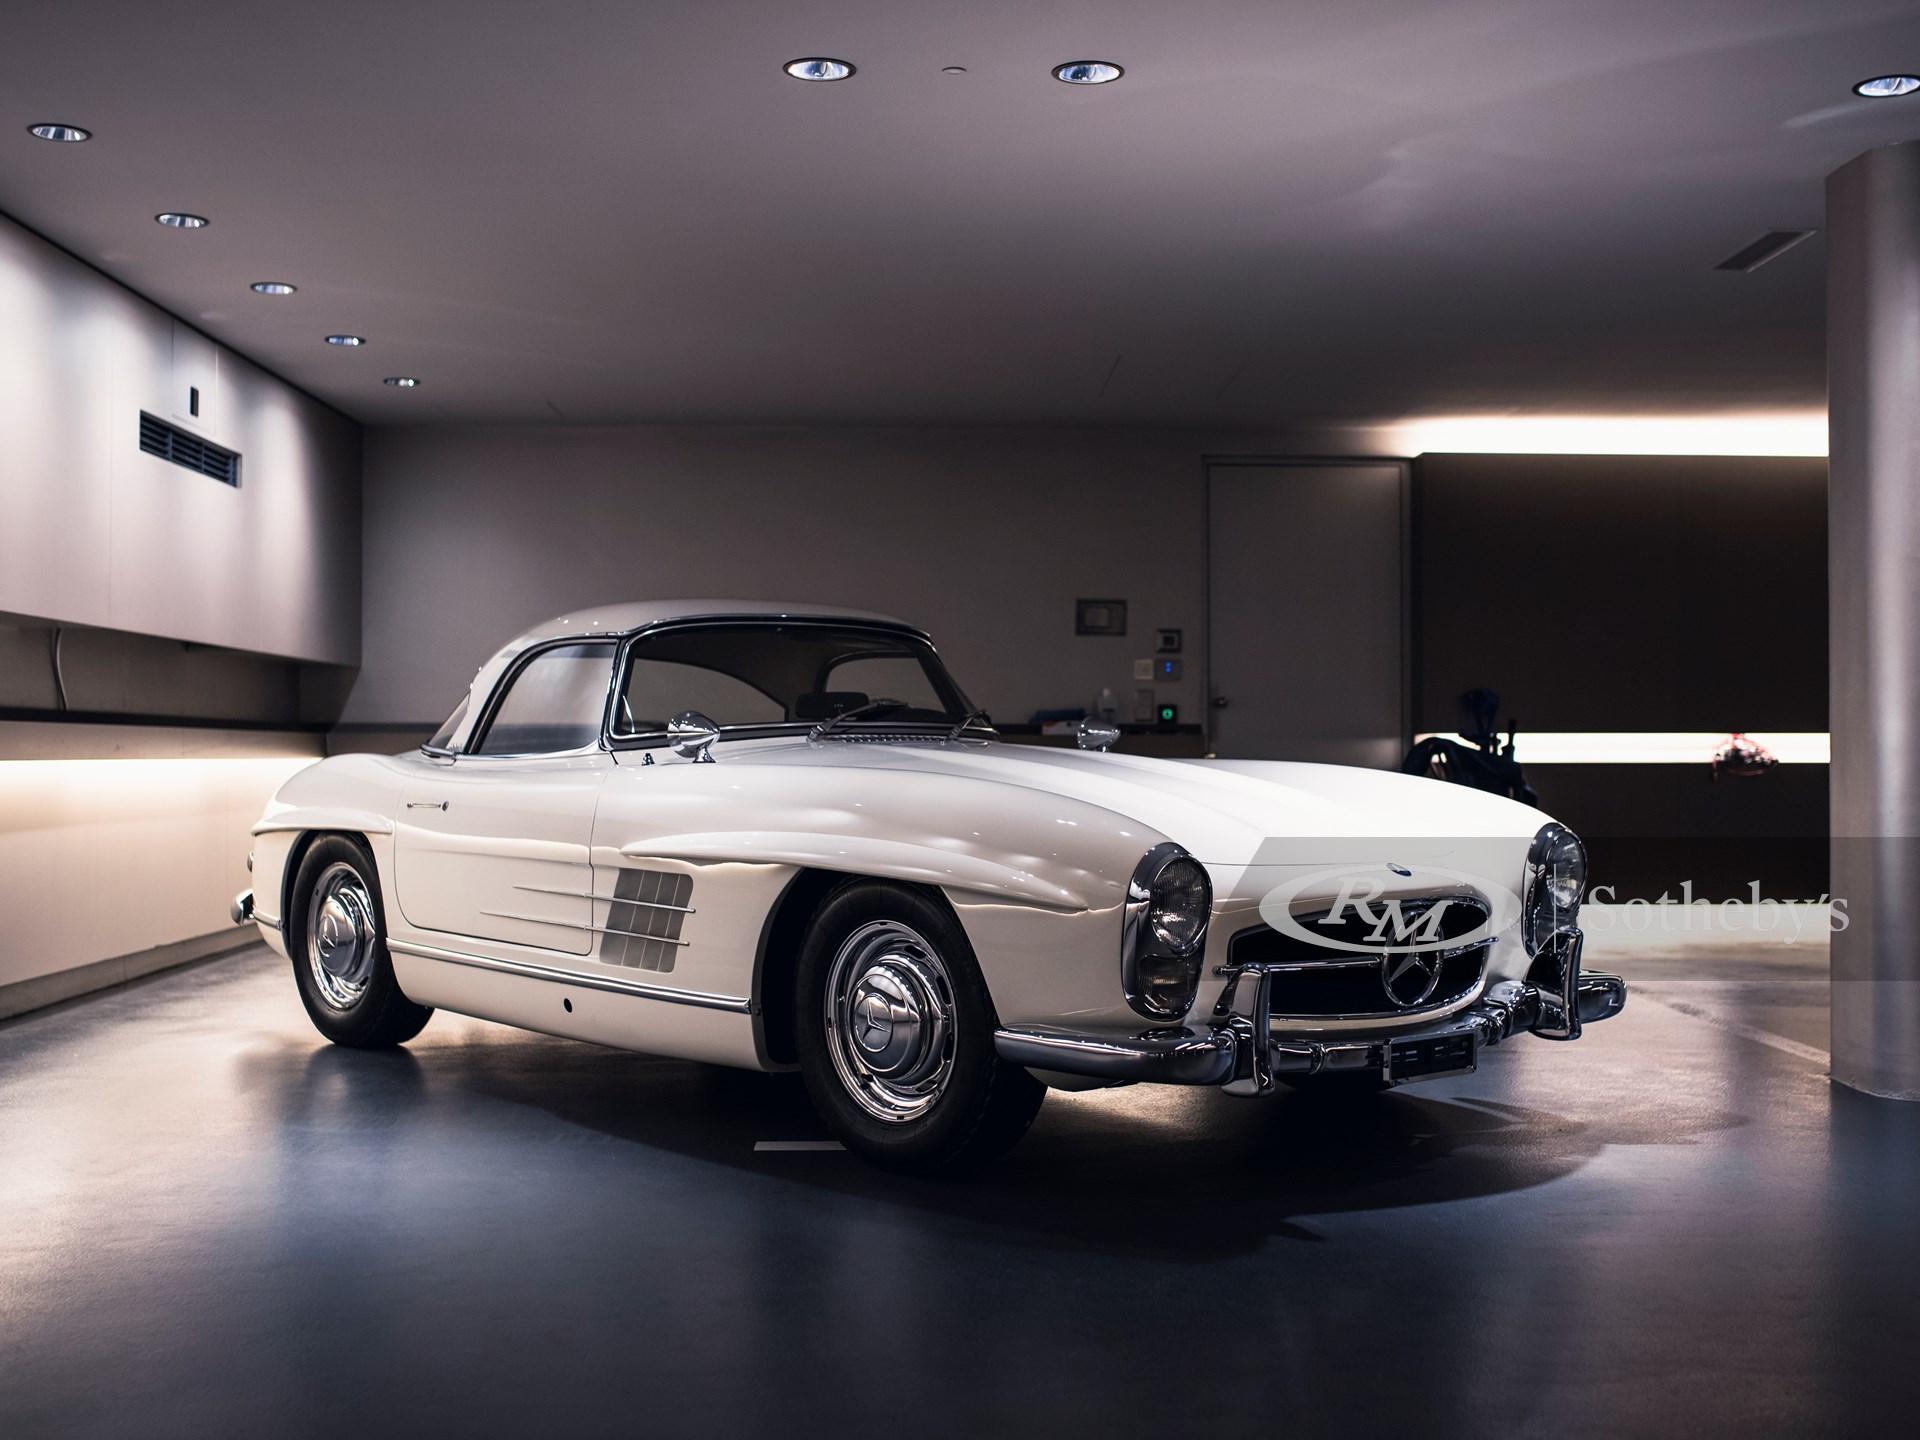 1961 Mercedes-Benz 300 SL Roadster Daniel Zizka ©2021 Courtesy of RM Sotheby's